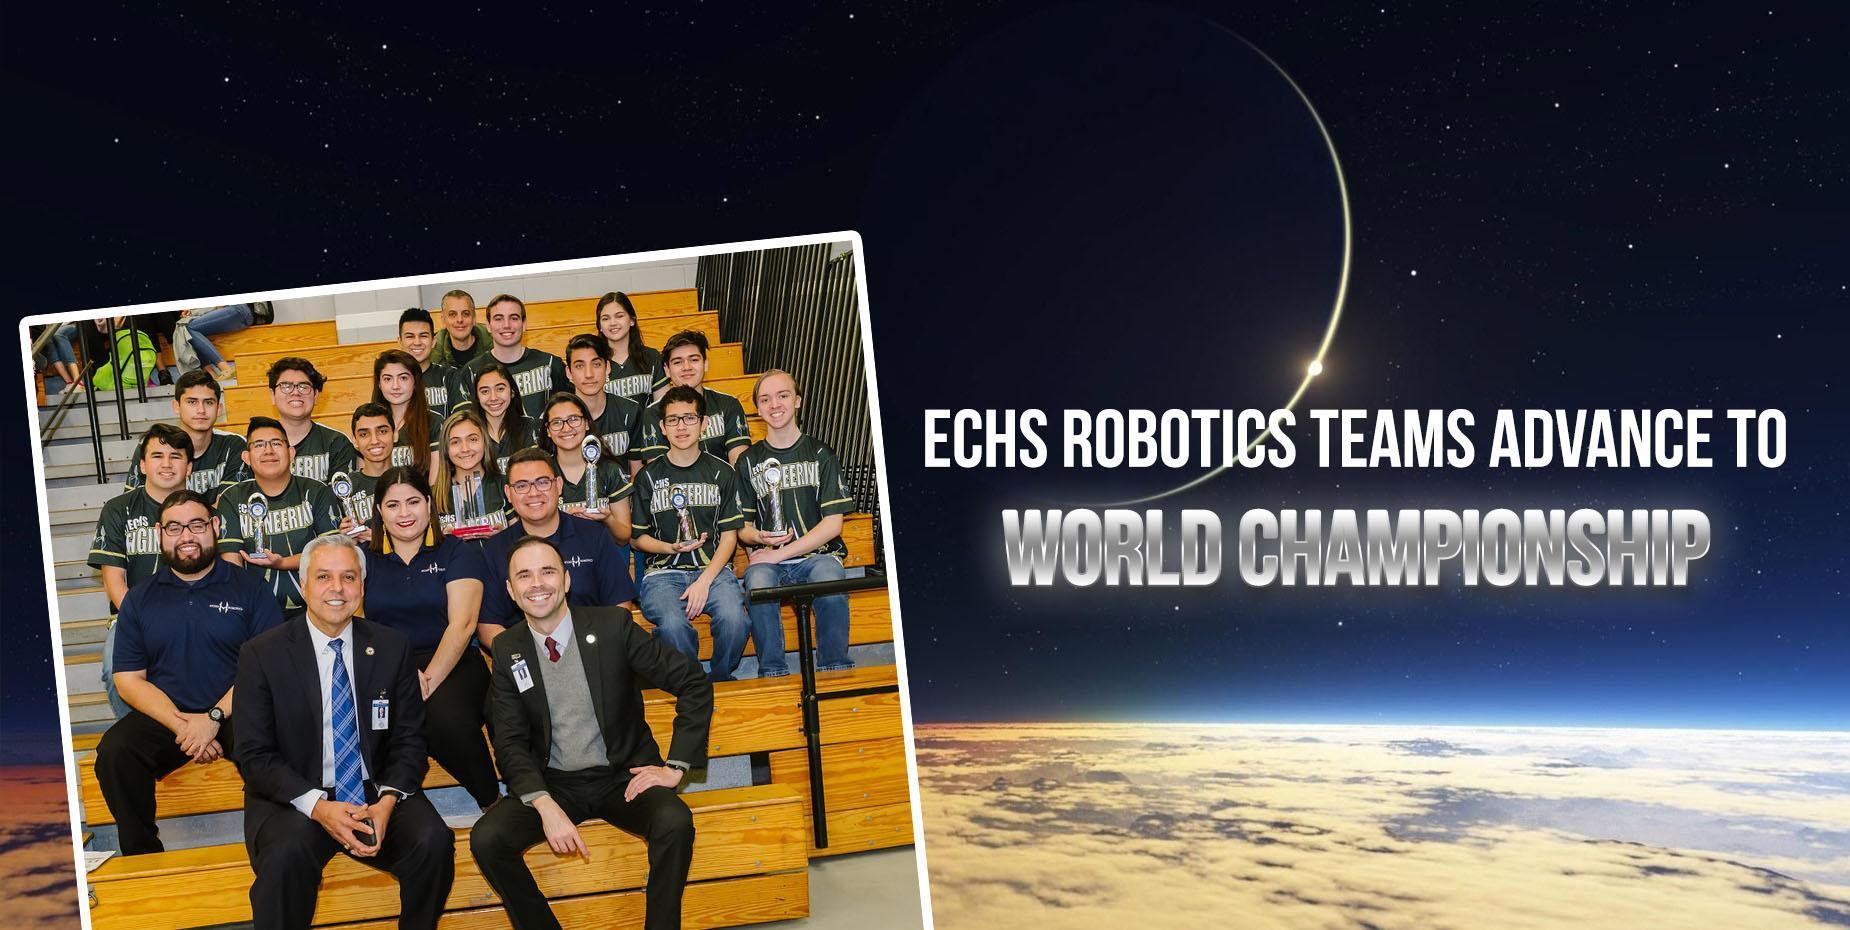 ECHS Robotics Team Advances to World Championship